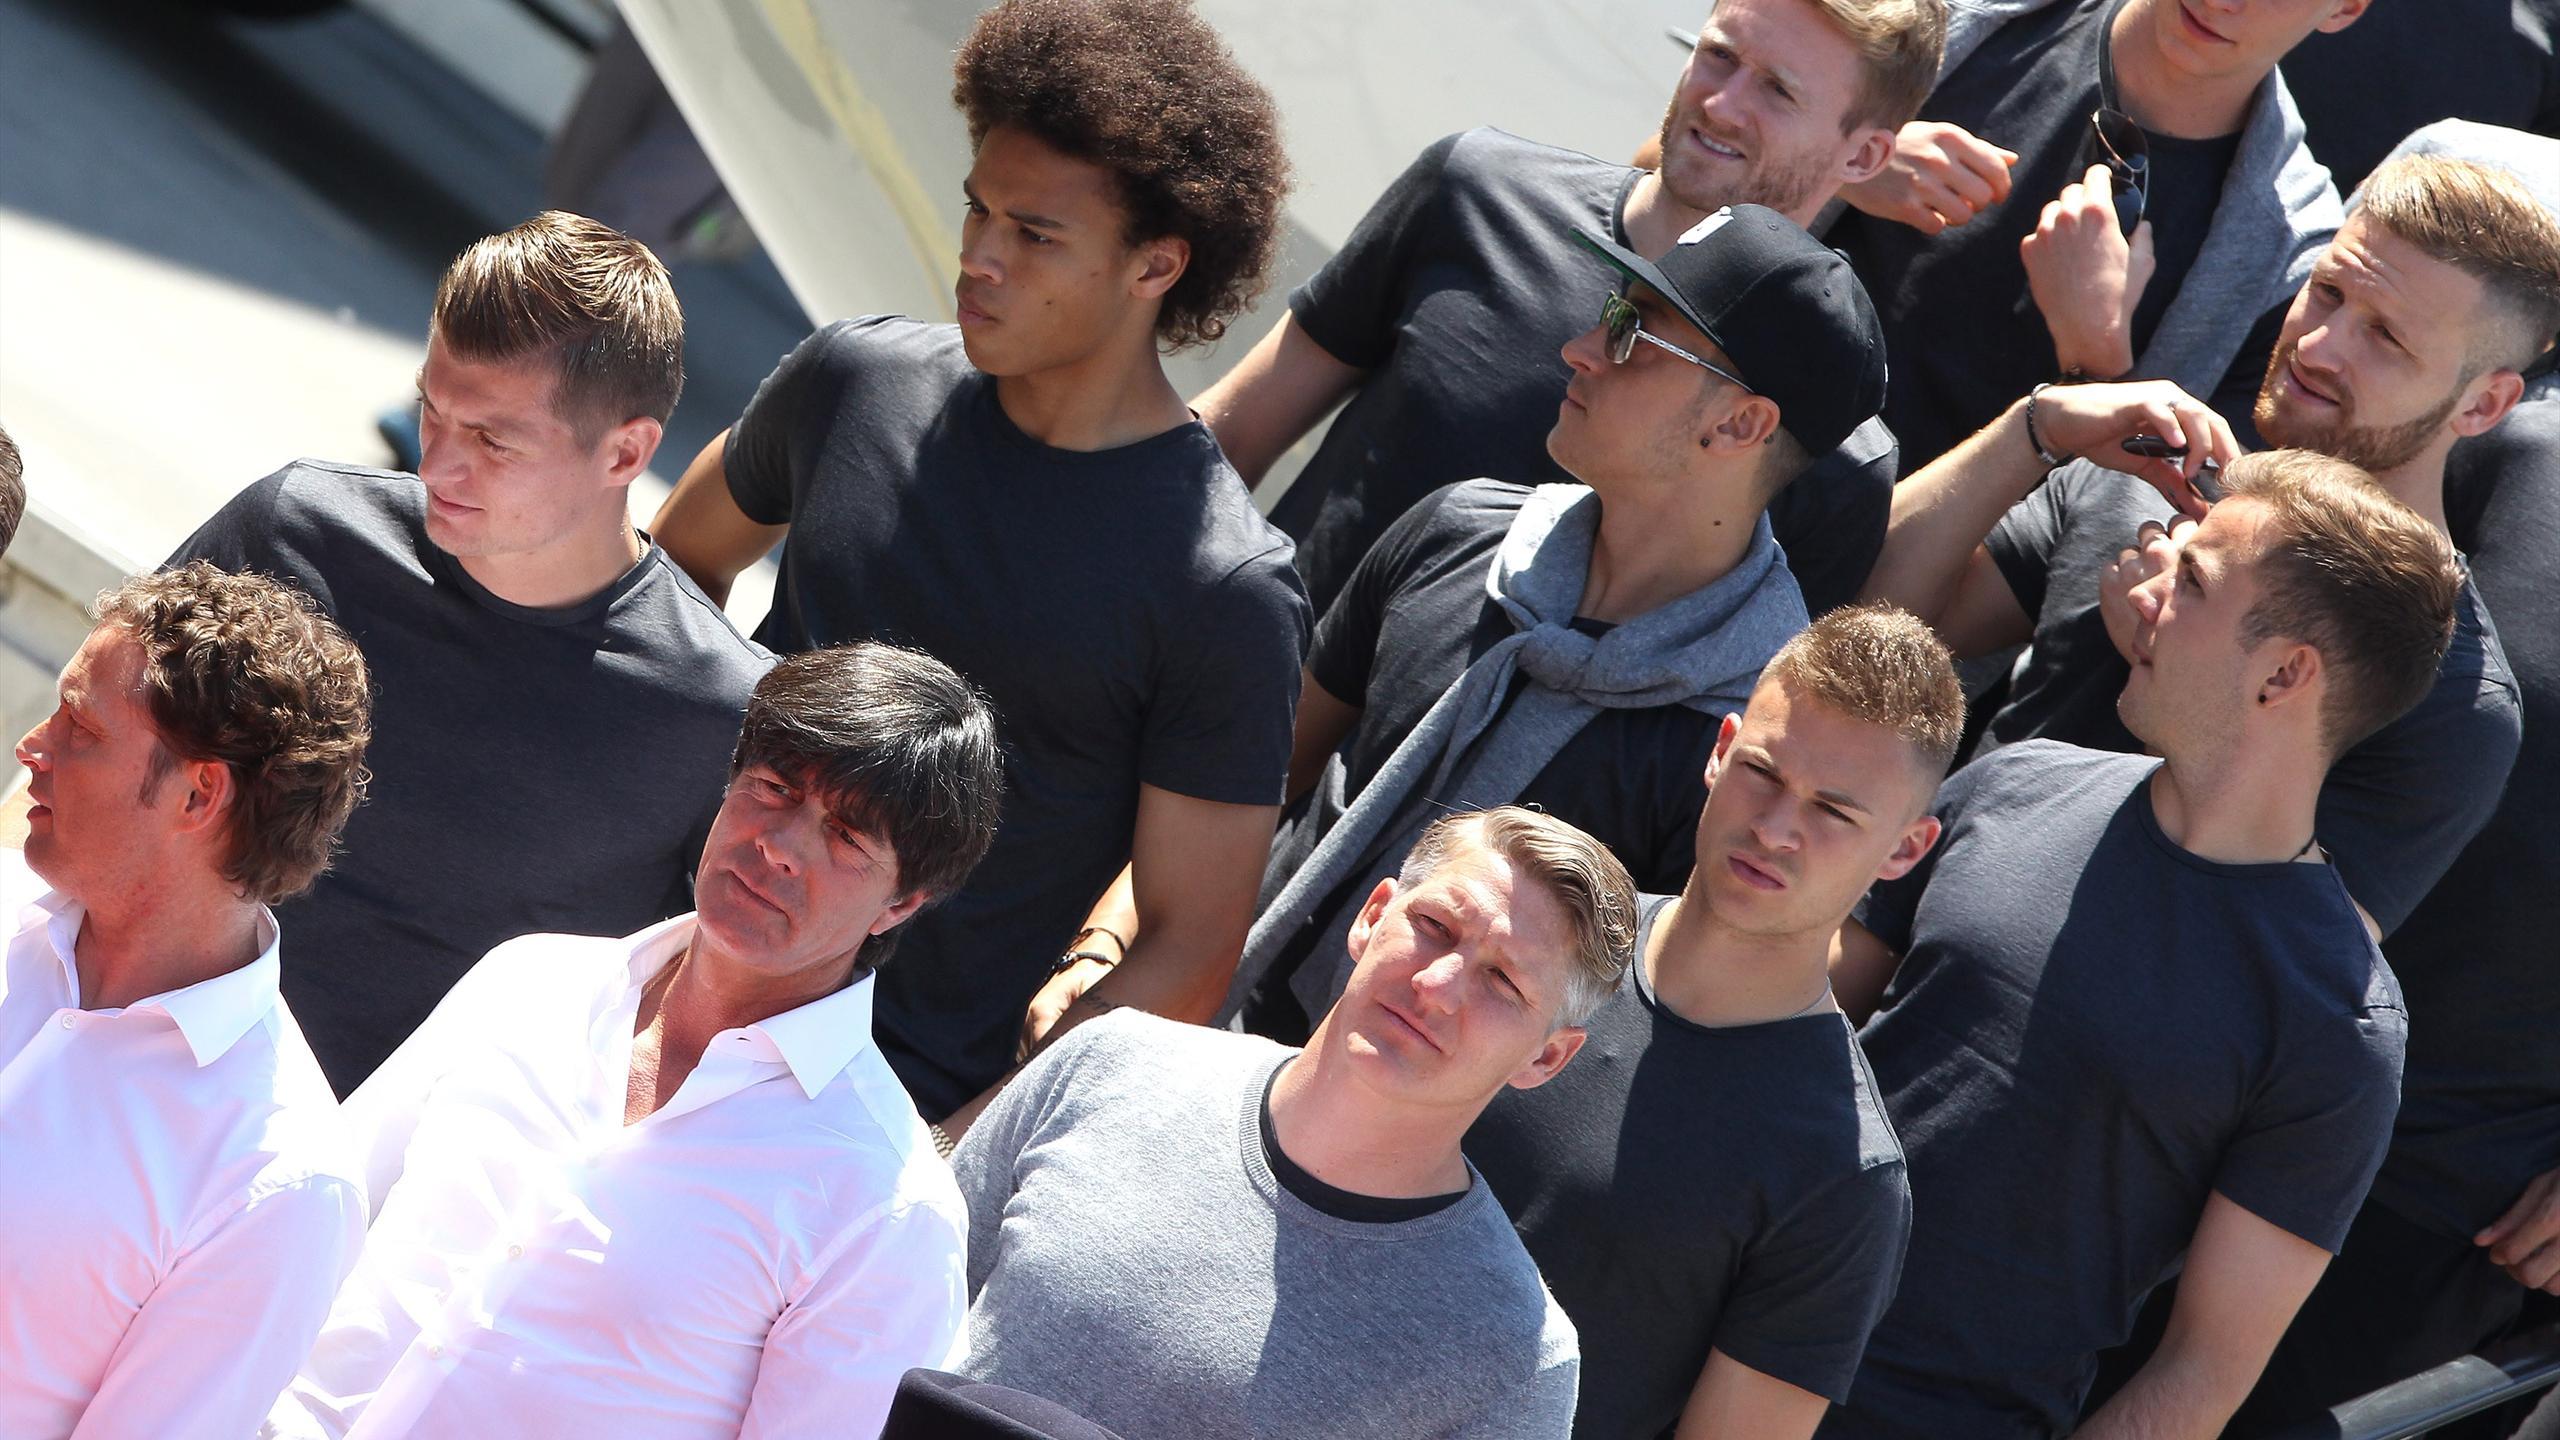 Germany's head coach Joachim Loew (front row, L to R),Germany's midfielder Bastian Schweinsteiger, midfielder Joshua Kimmich, forward Mario Goetze, defender Shkodran Mustafi, (Back row, L to R) midfielder Toni Kroos,forward Leroy Sane, midfielder Mesut Oe